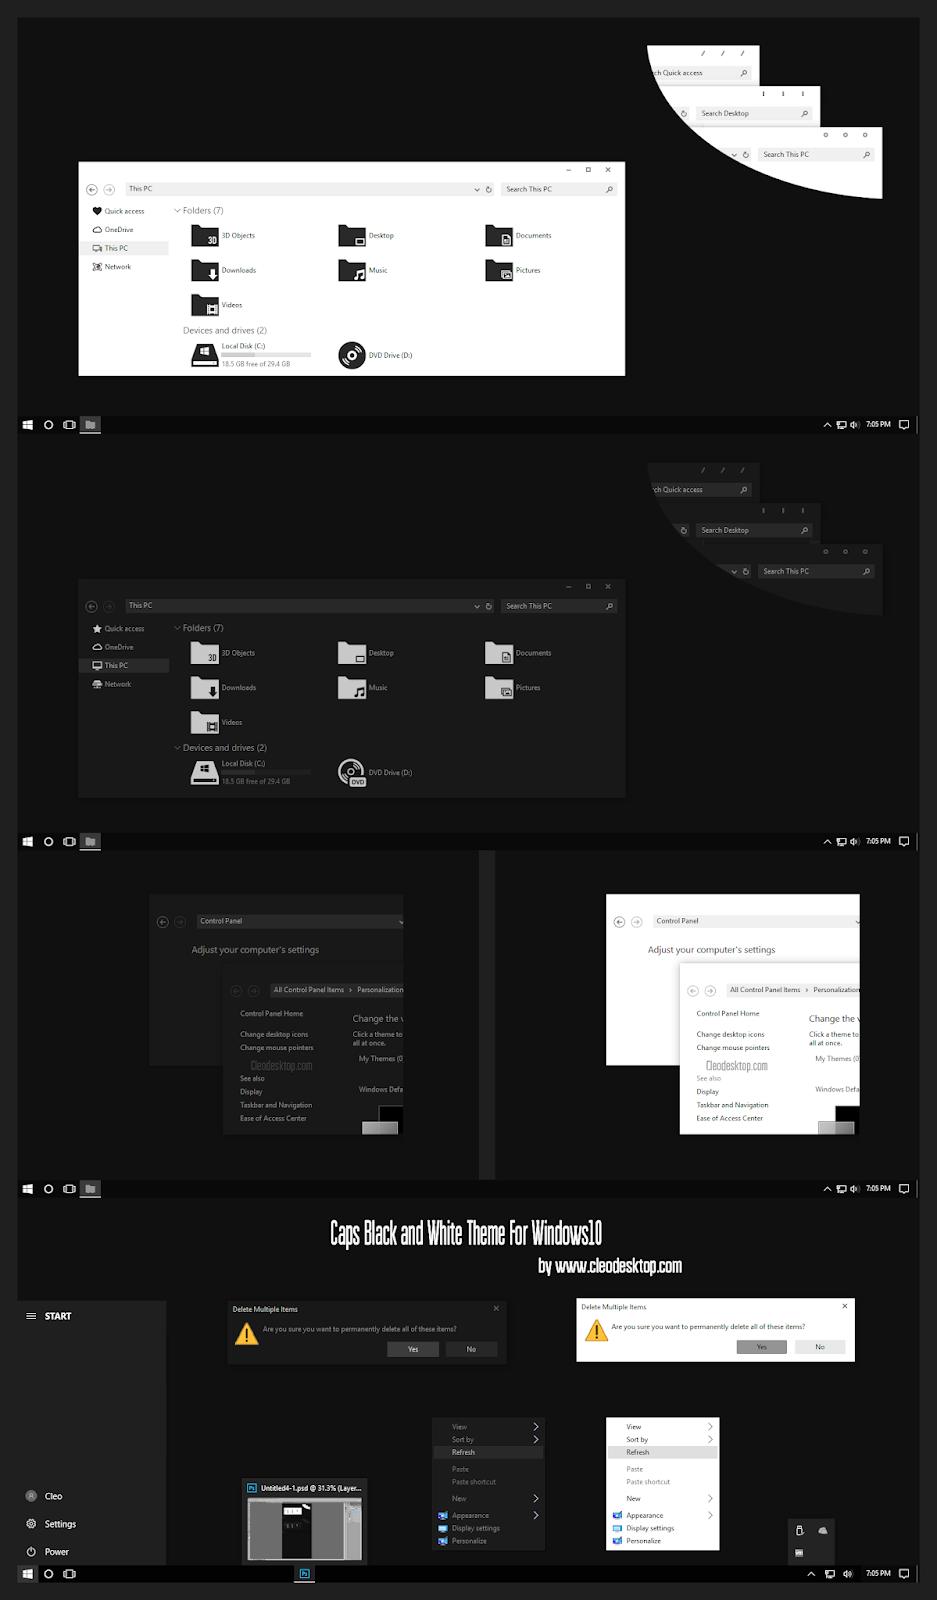 Caps Black and White Theme Windows10 November 2019 Update 1909